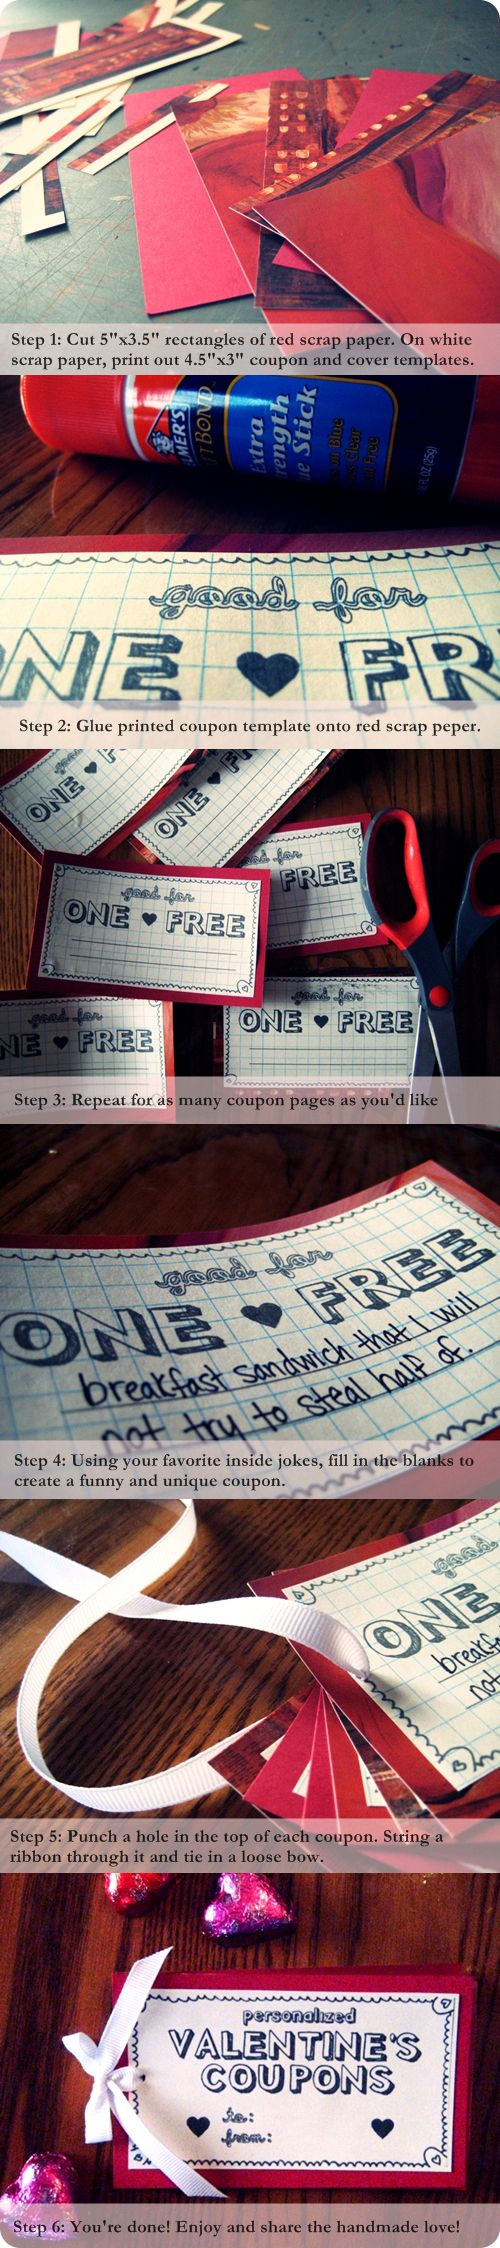 Boyfriend coupon book printable